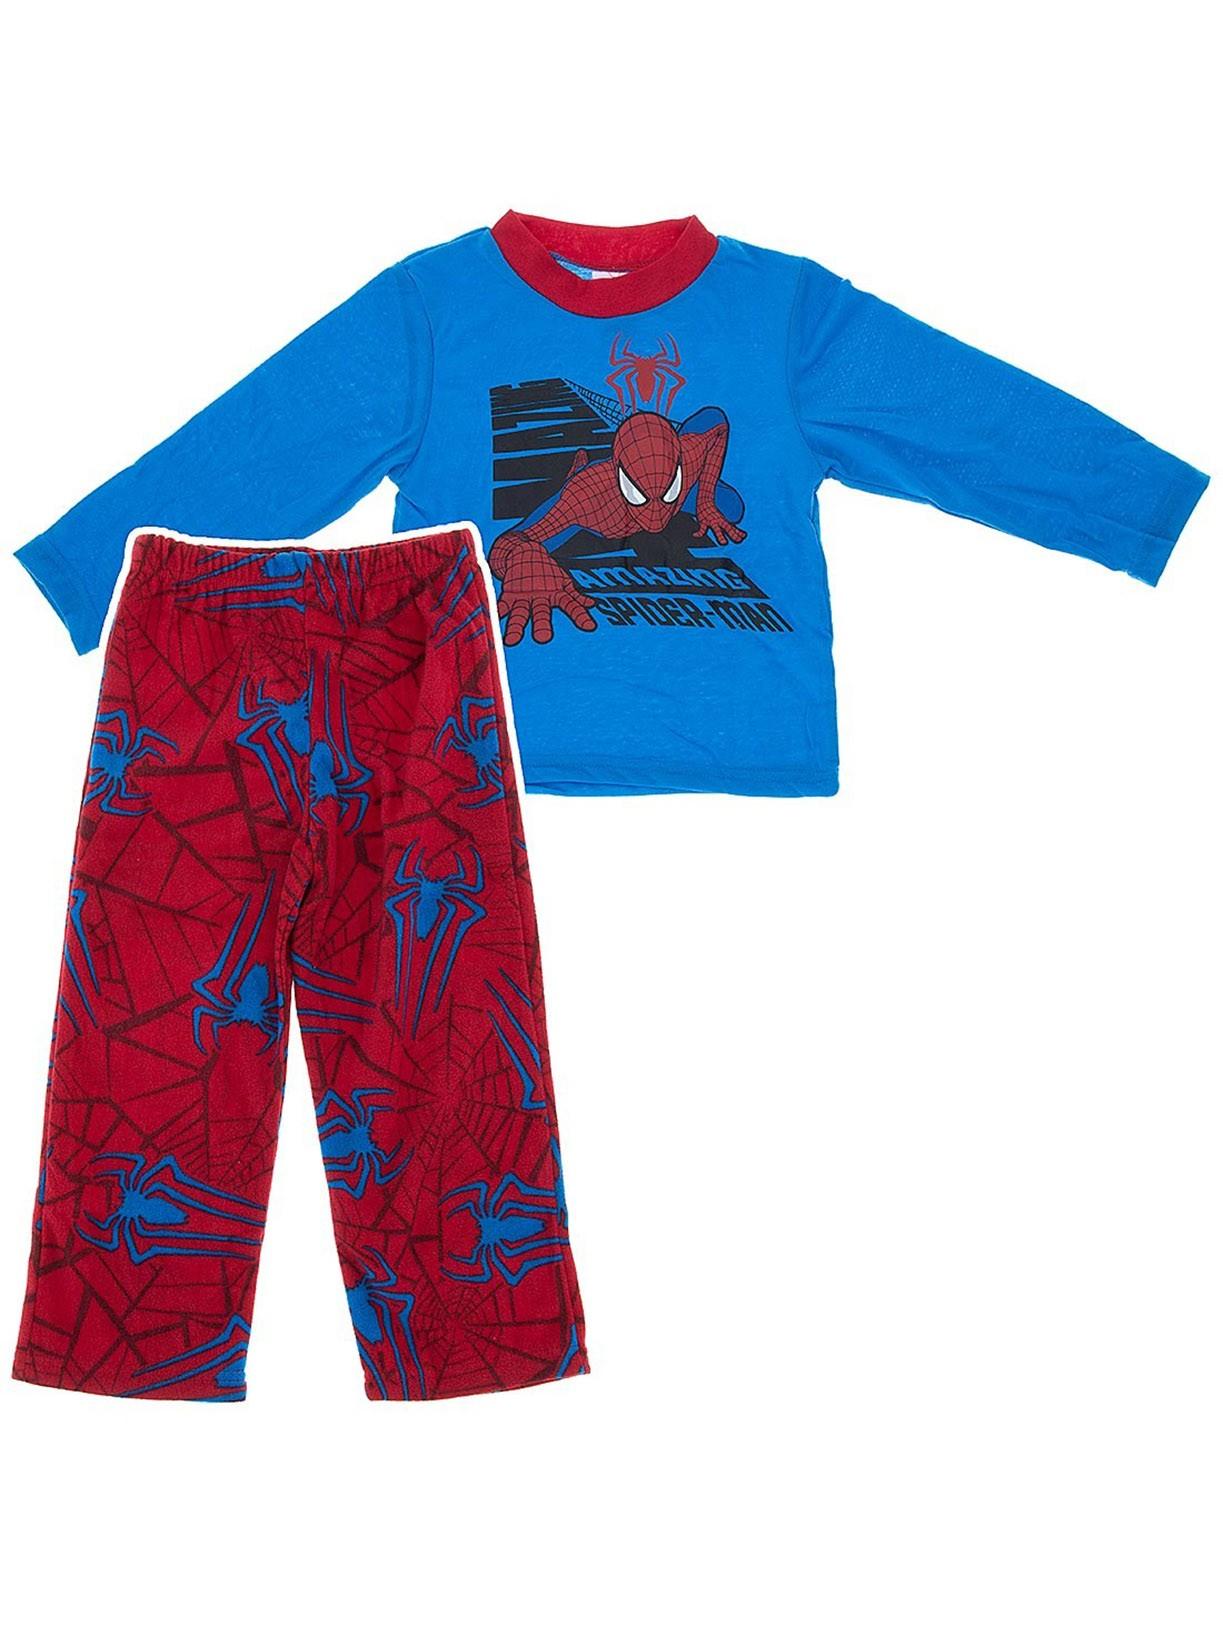 Marvel Comics Boys The Amazing Spider-man Pajama Set M/8